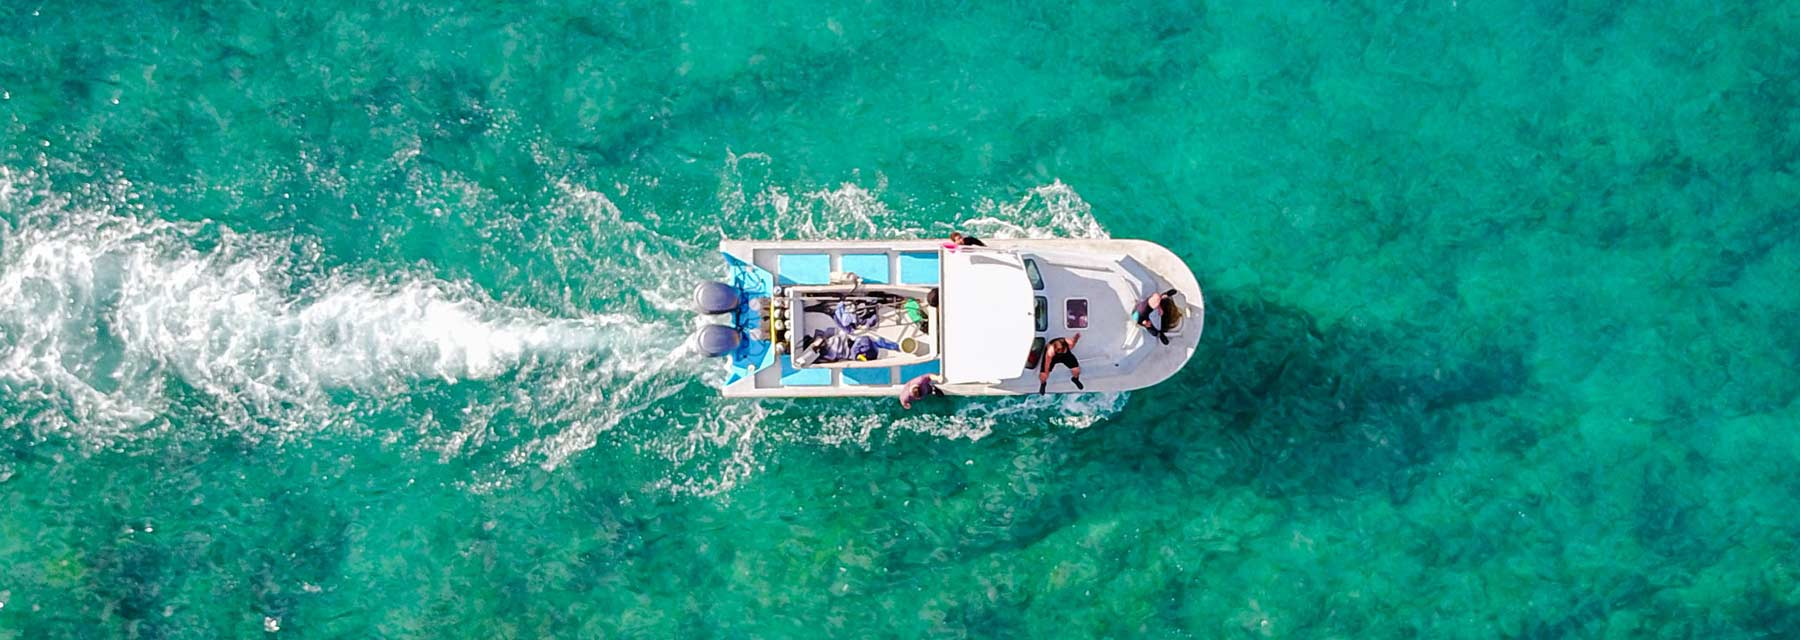 overhead boat on the ocean